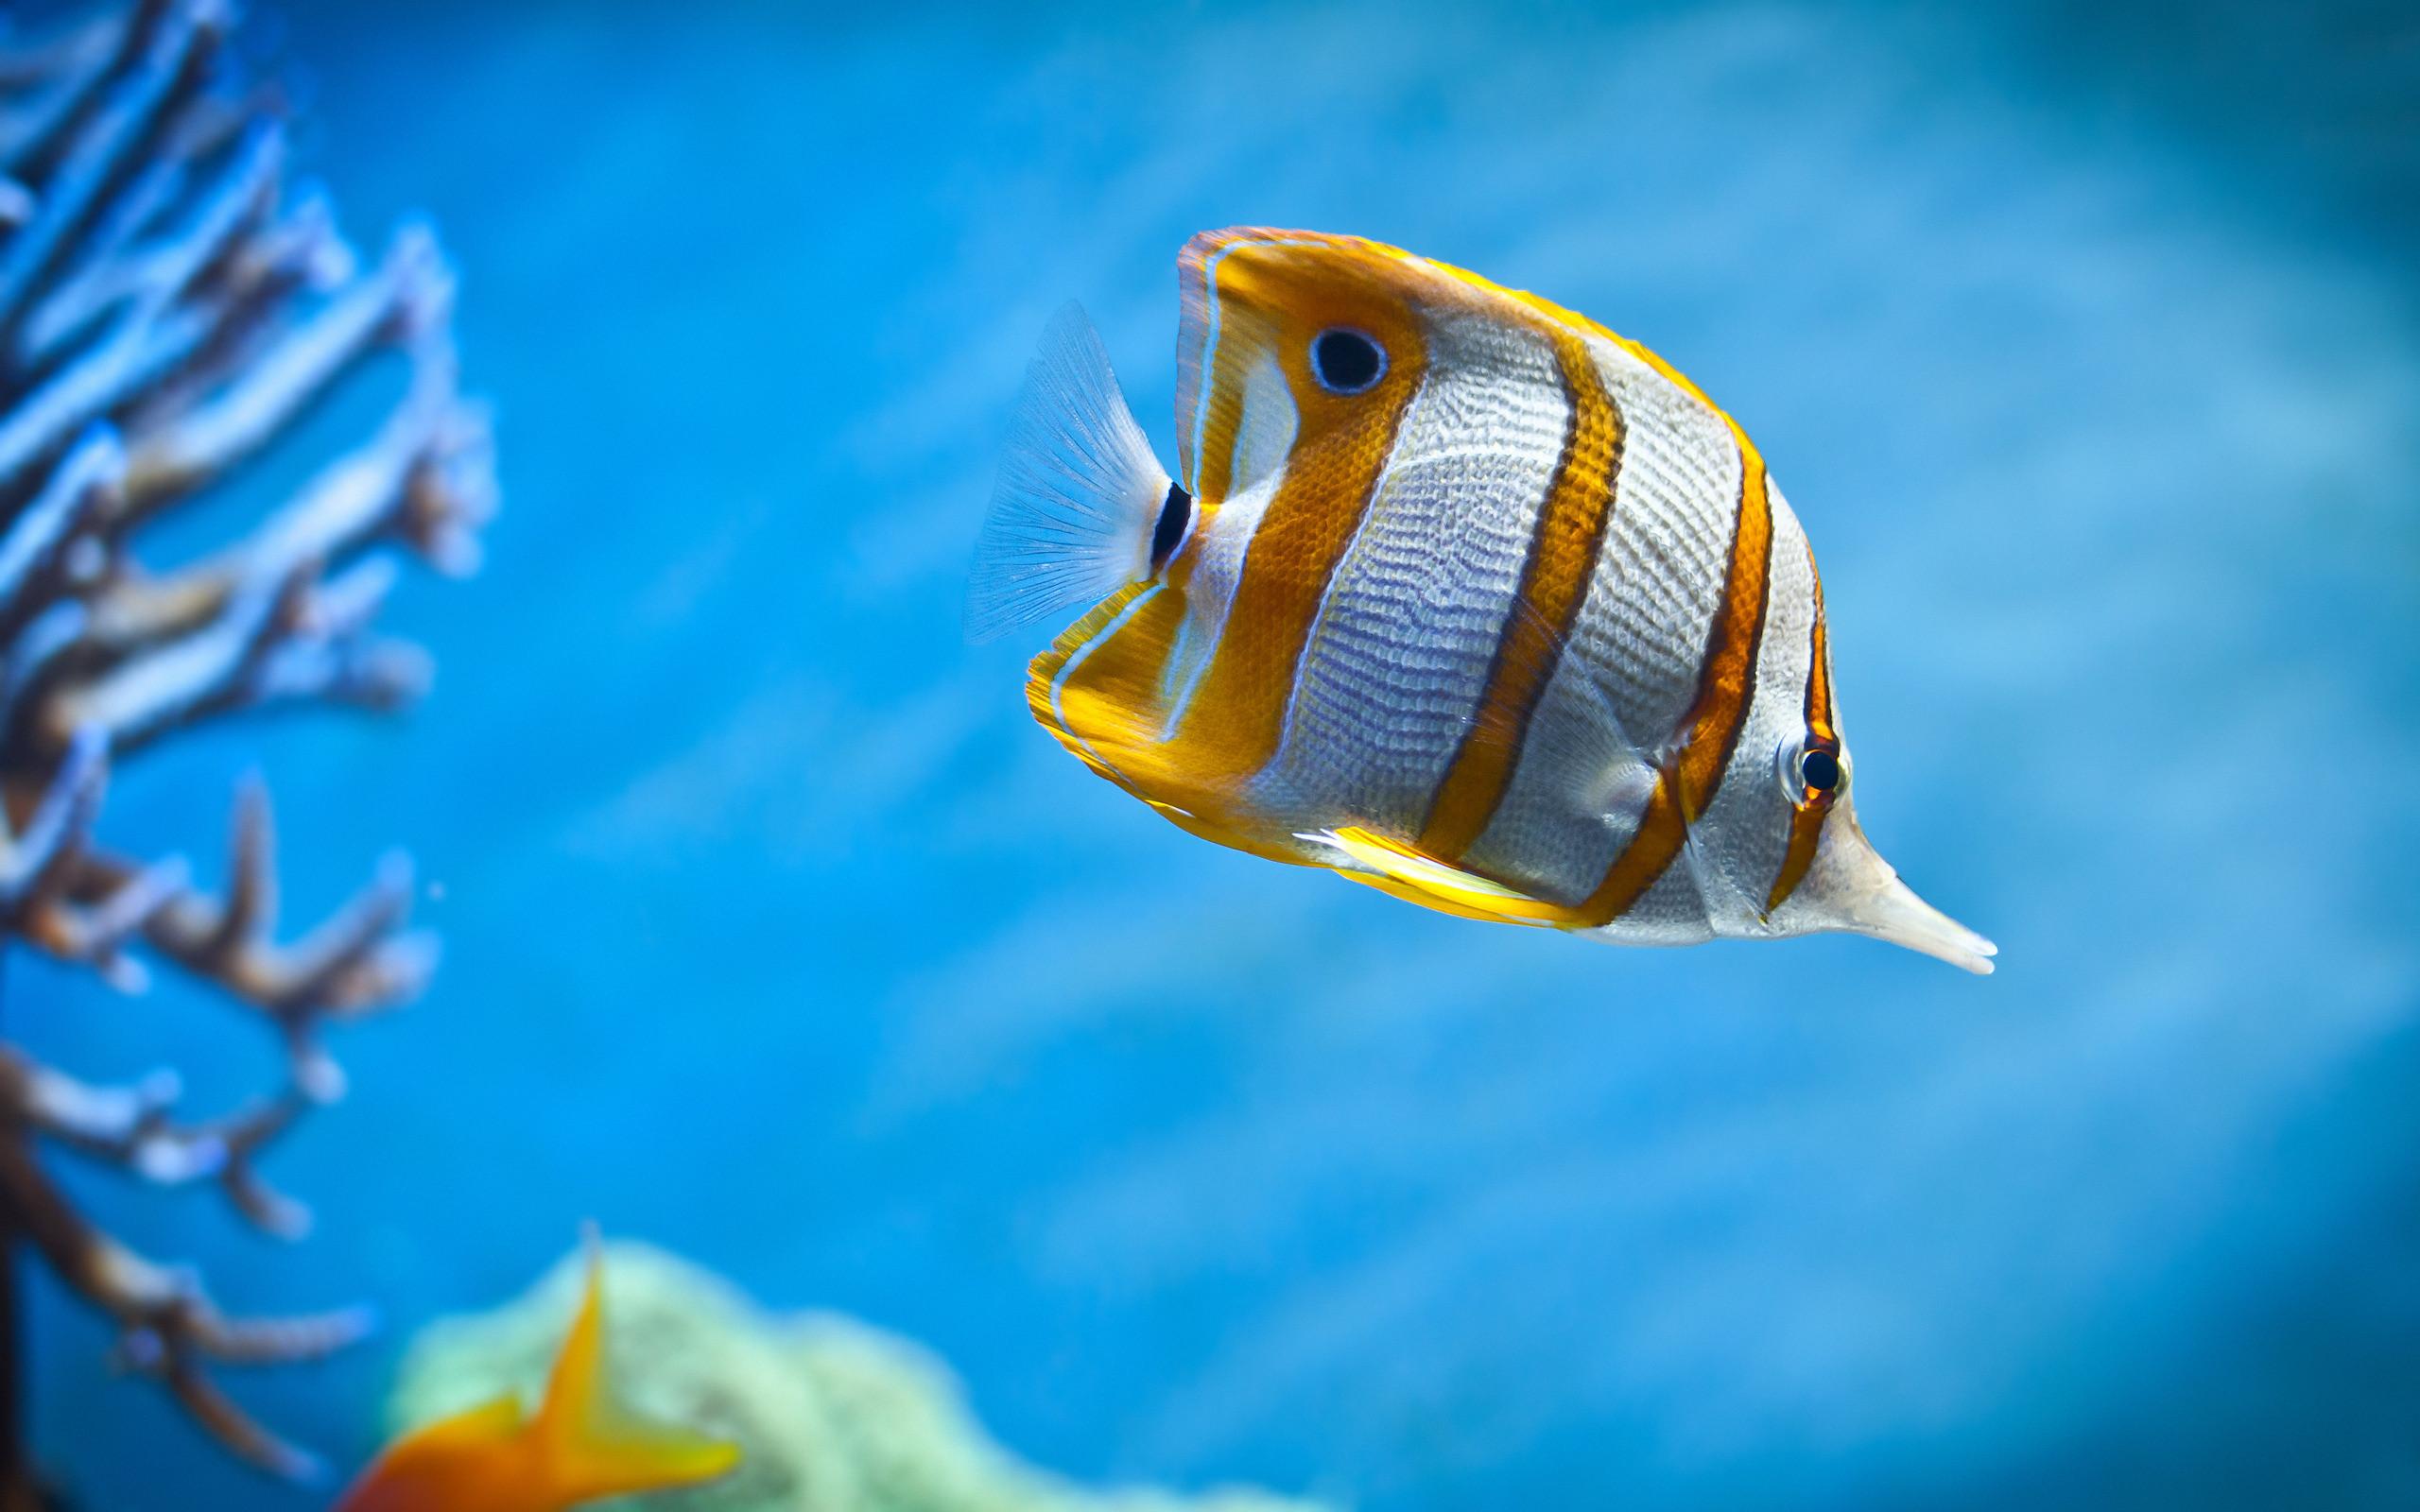 Saltwater Fish Wallpaper 58 Images